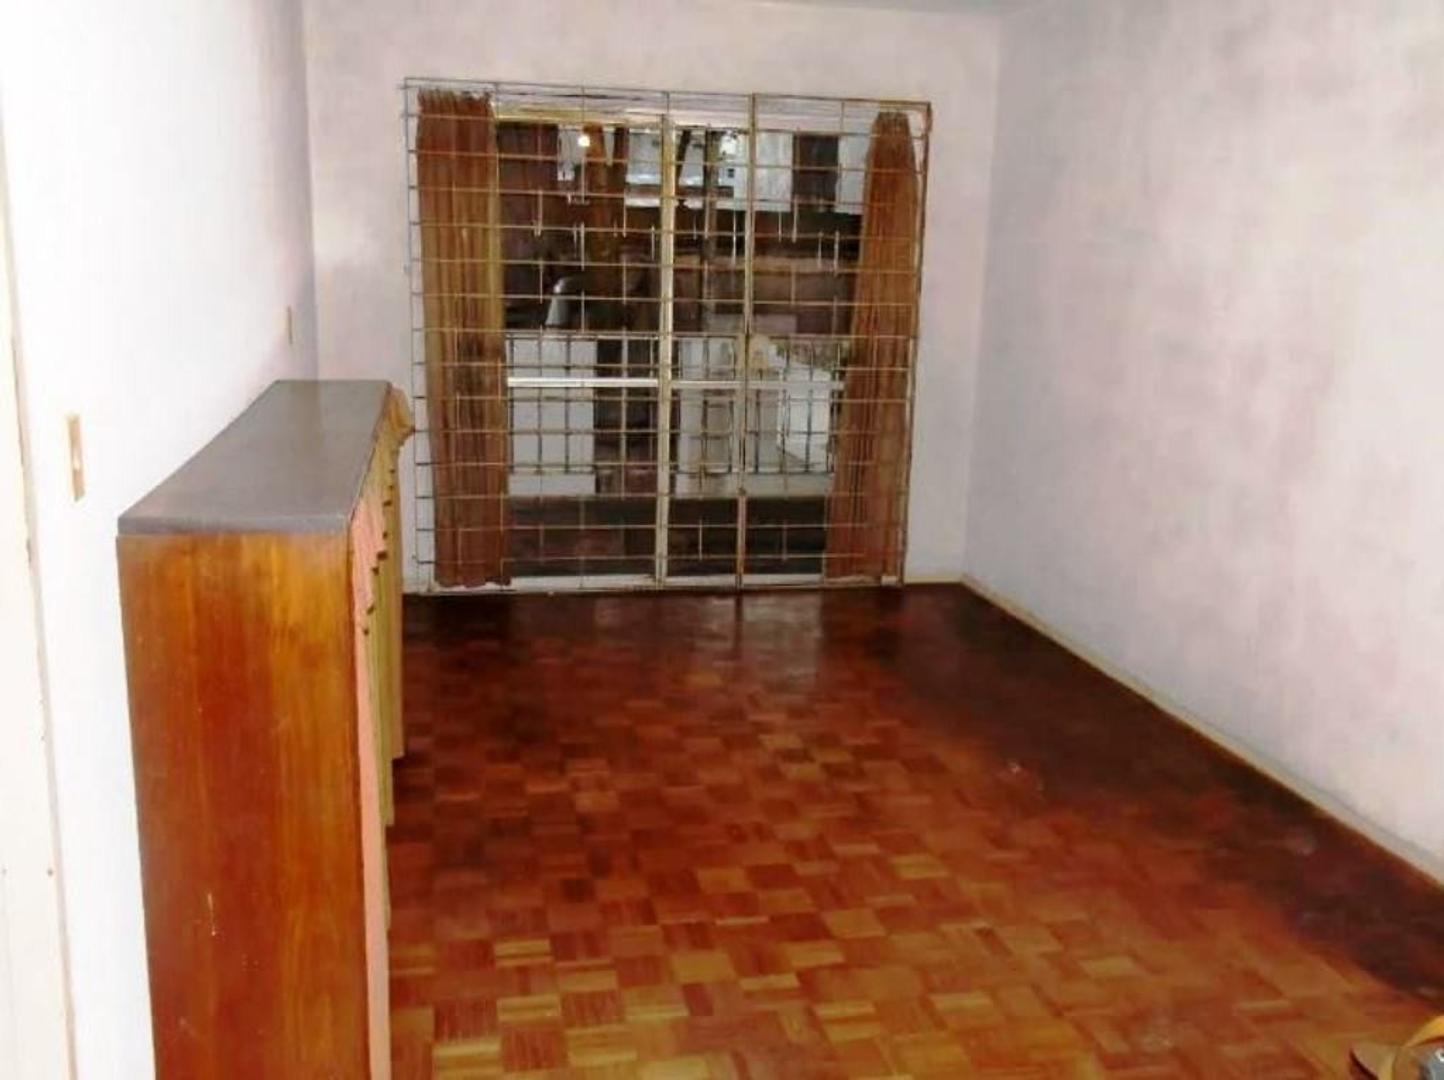 XINTEL(OTG-OTG-989) Departamento - Venta - Uruguay, Montevideo - RODO, JOSE ENRIQUE 1200